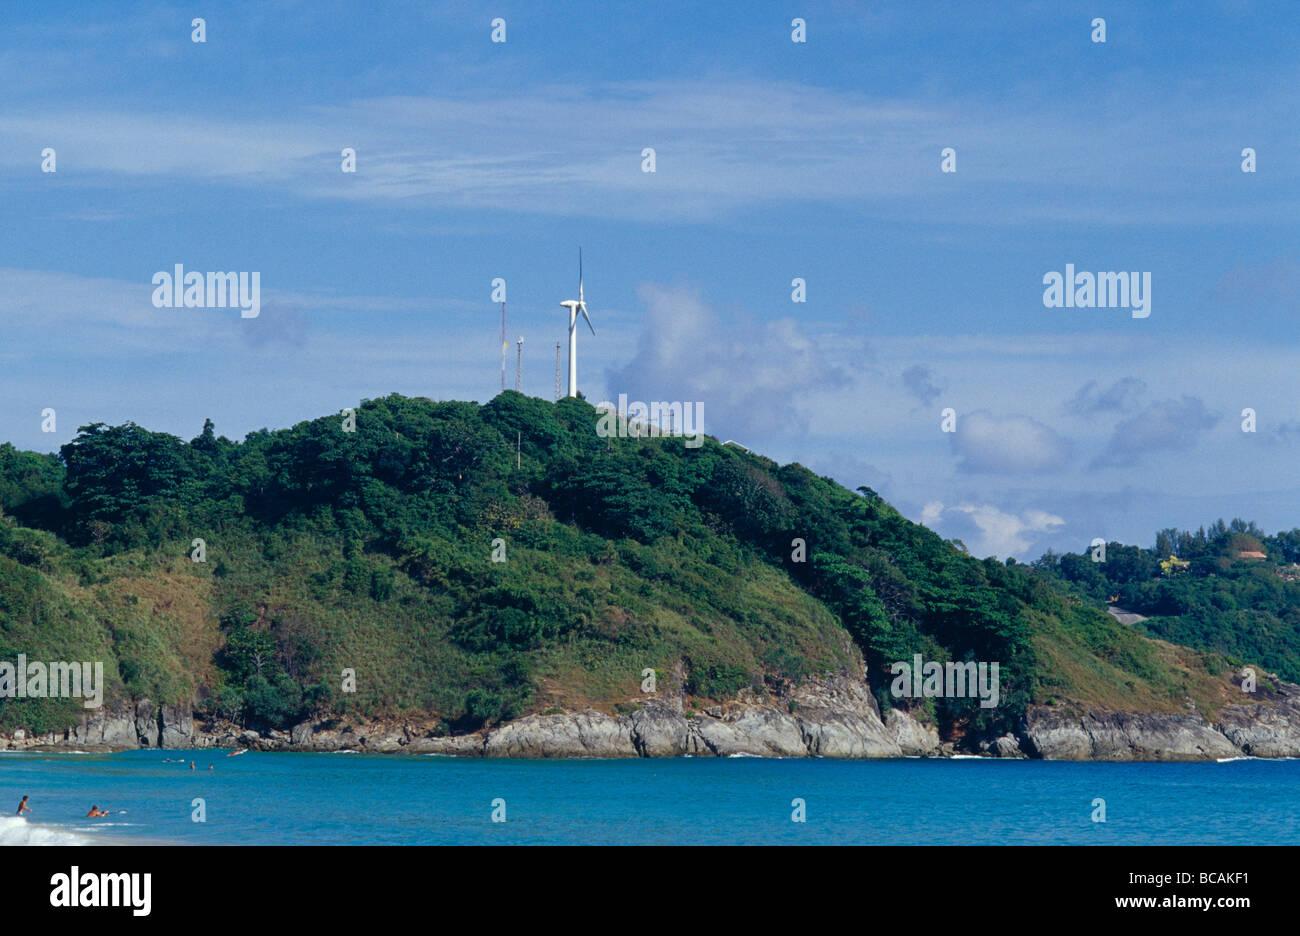 An environmentally friendly energy wind farm on a coastal hilltop. - Stock Image